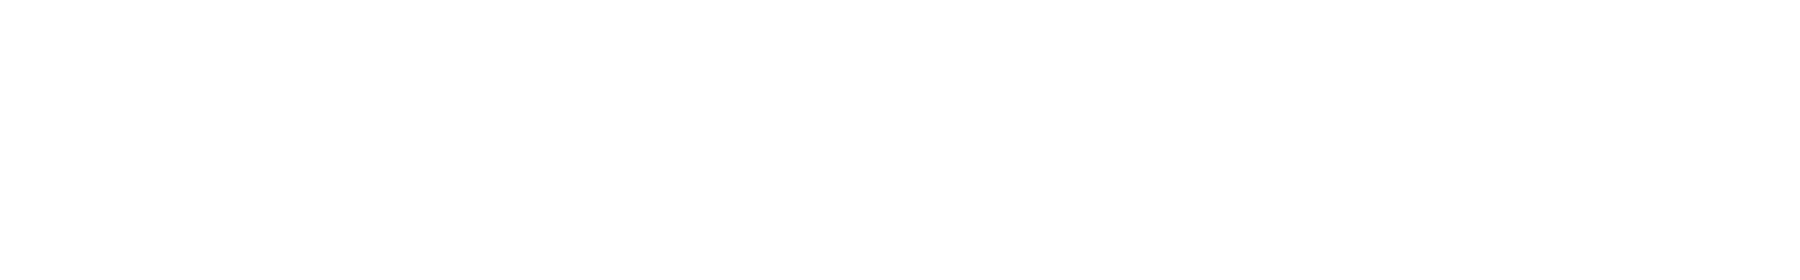 g abs05 007